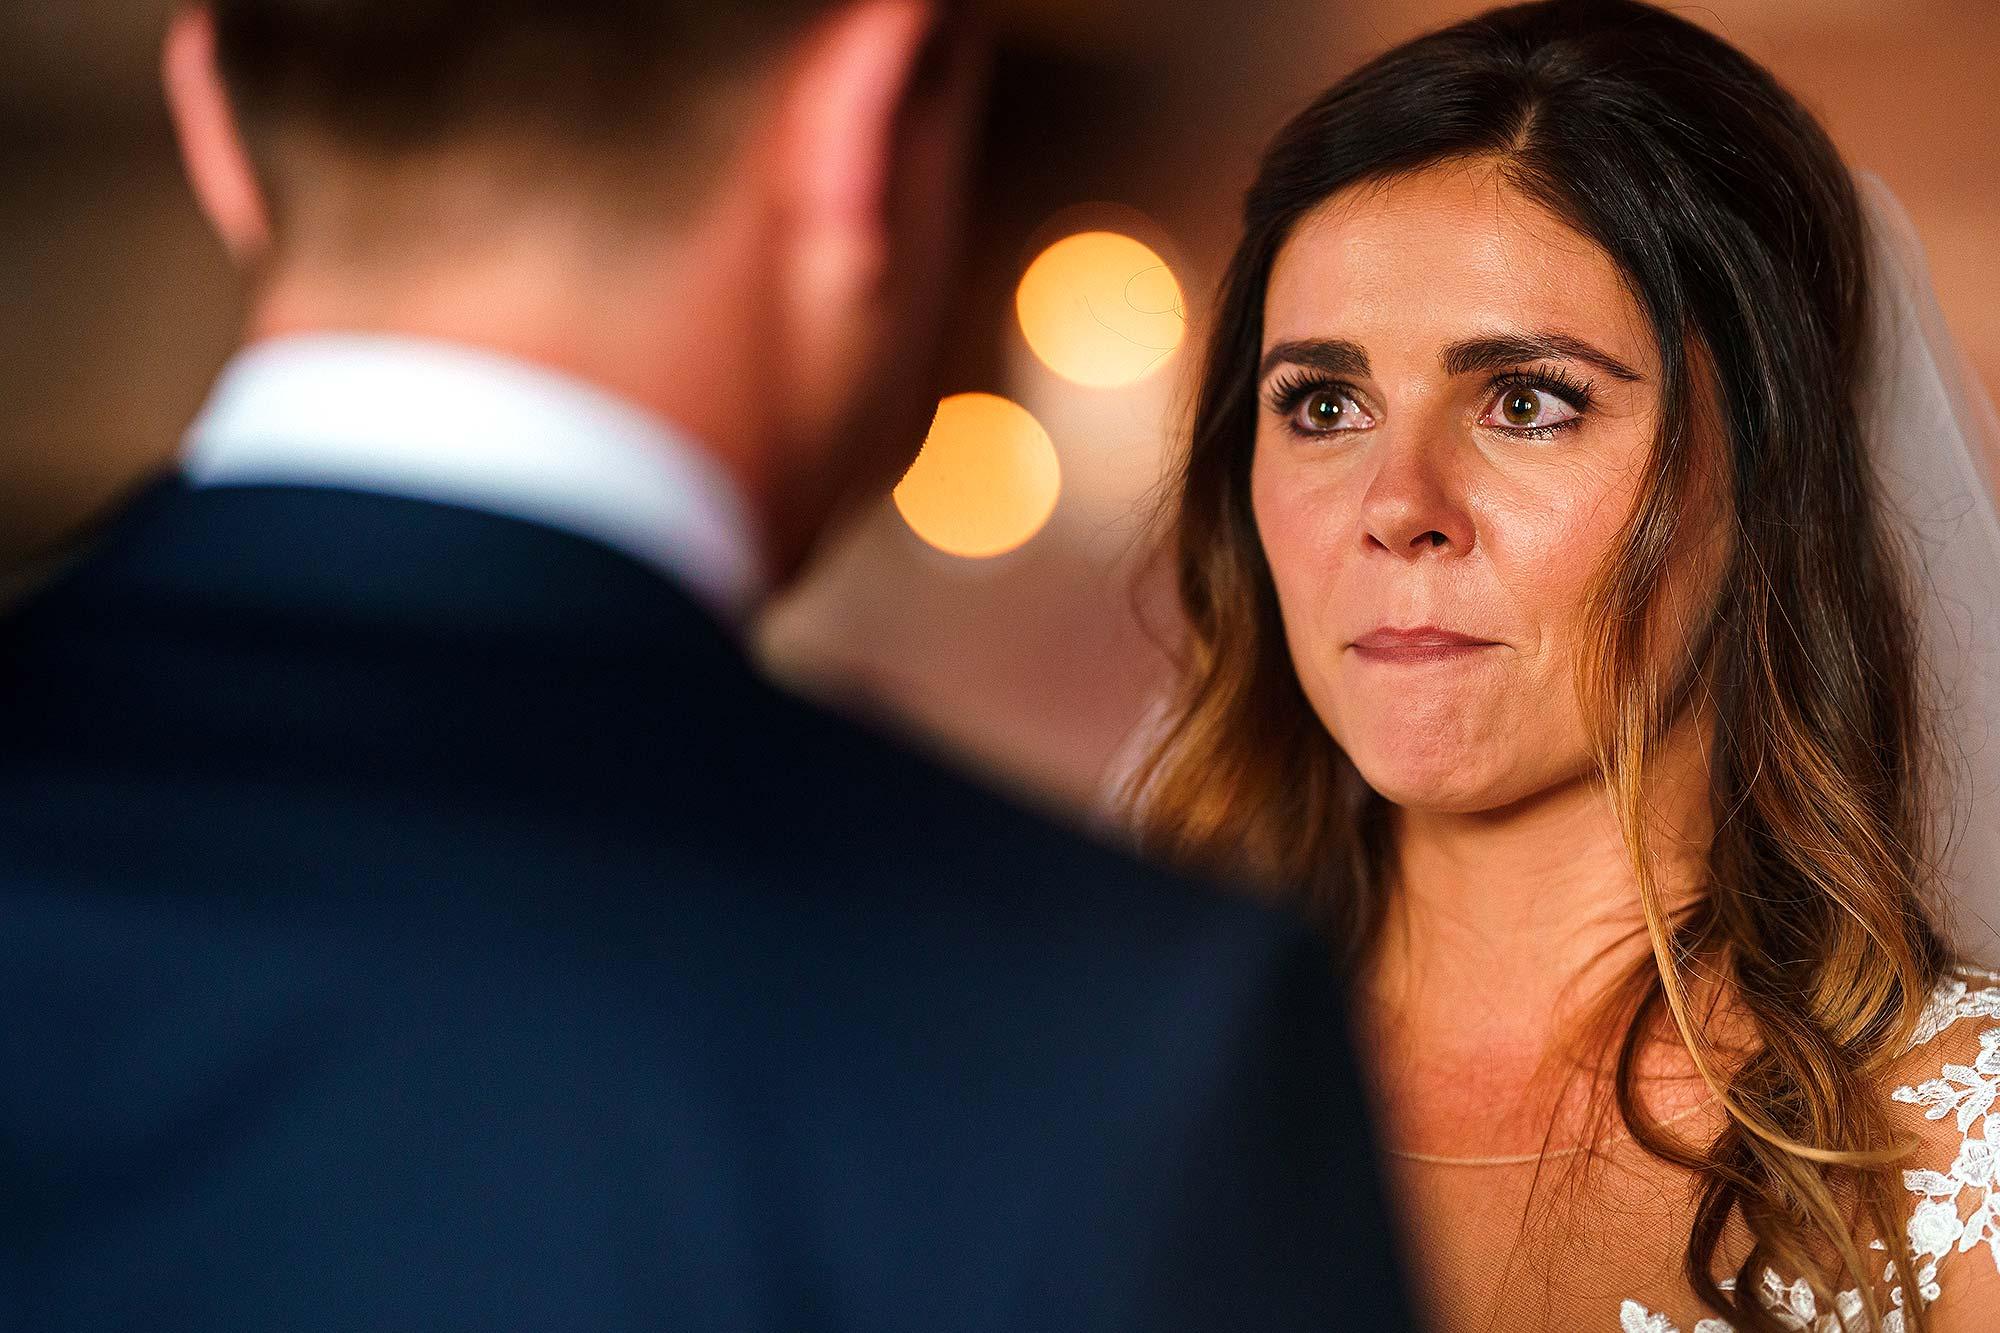 bride getting emotional during wedding ceremony at Peckforton castle